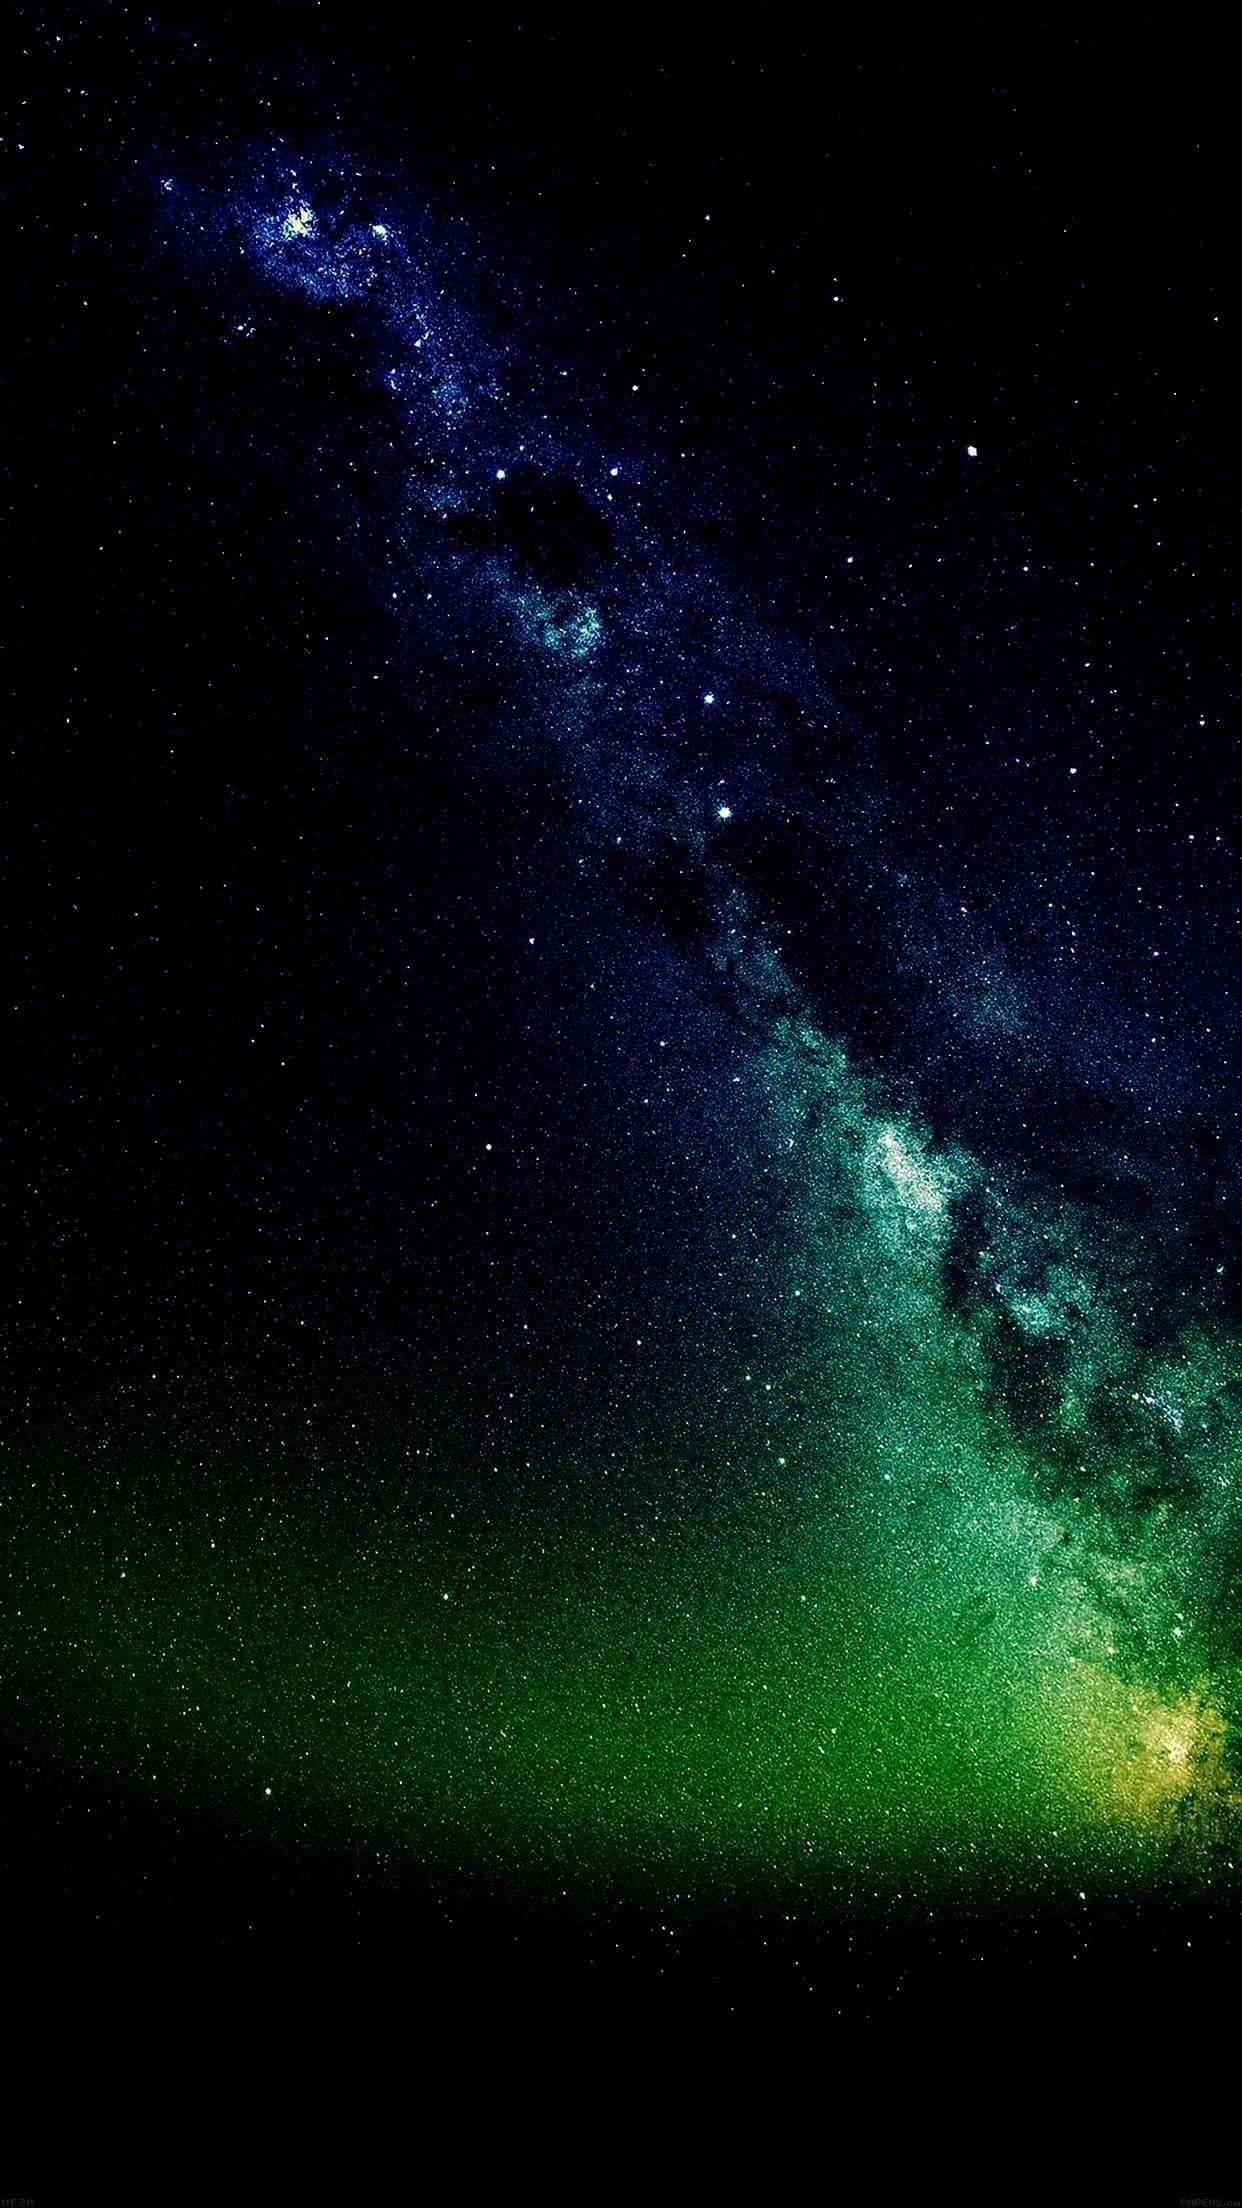 Dark Sky Wallpaper 4k Trick Latar Belakang Ruang Angkasa Gambar